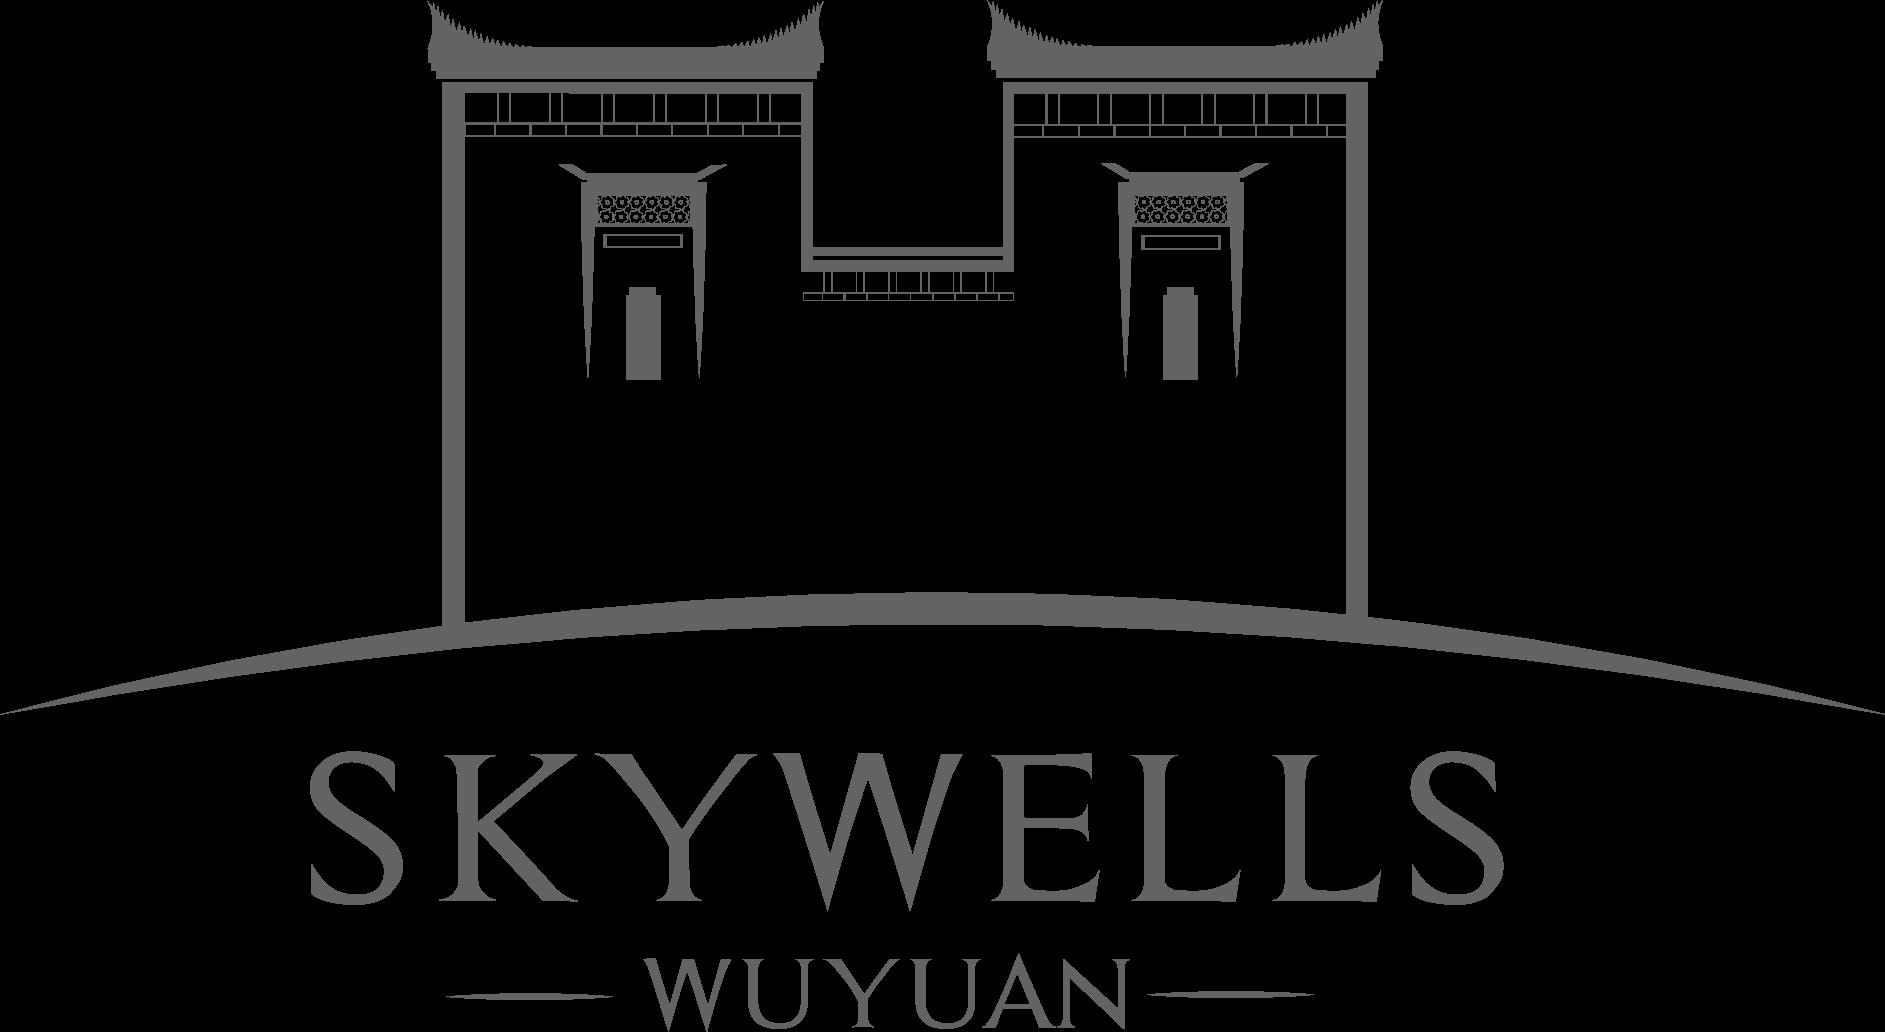 WuYuan Skywells